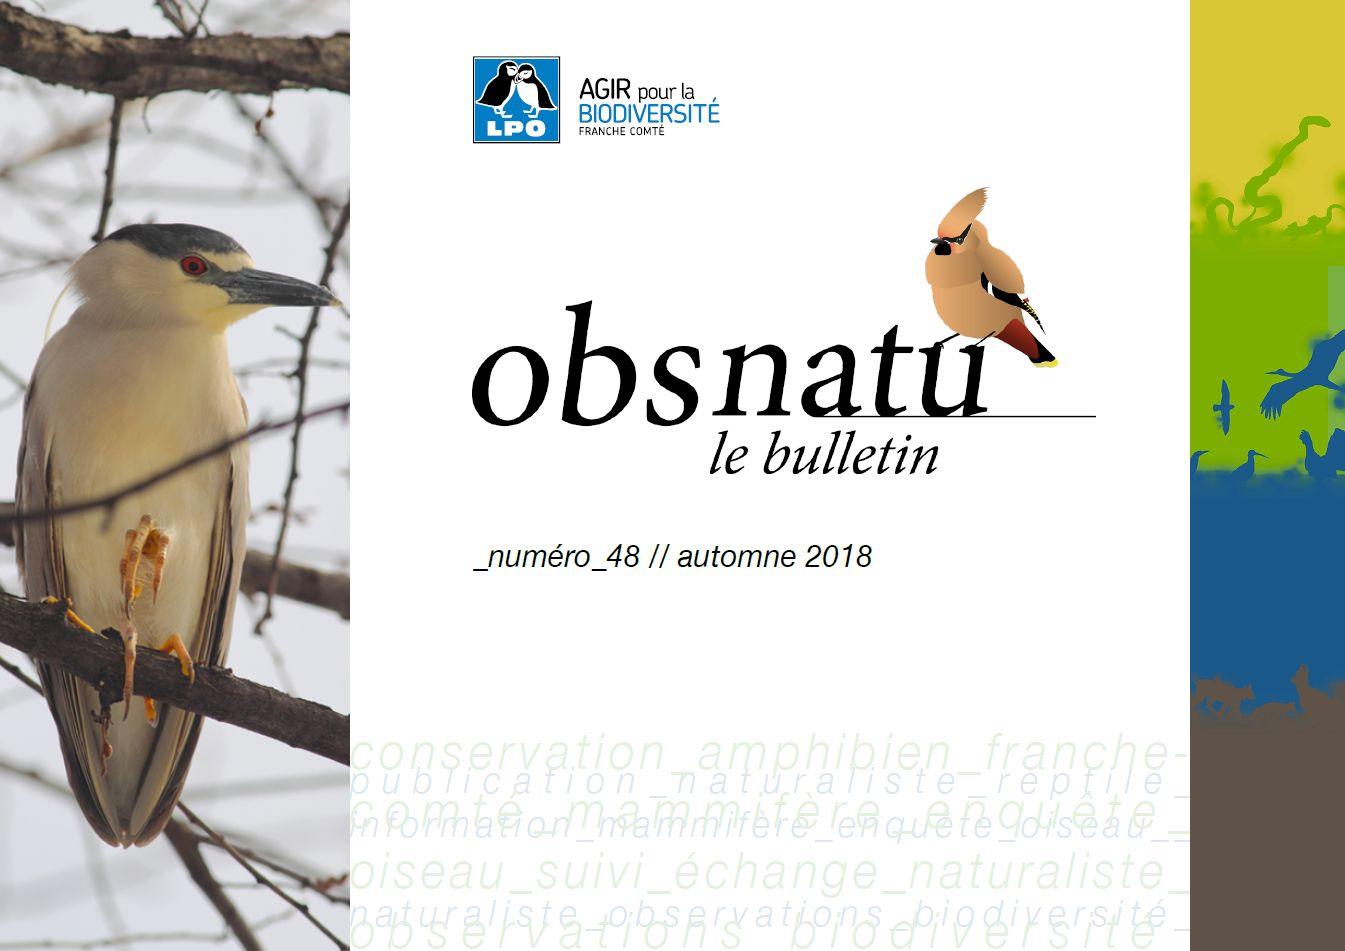 https://cdnfiles2.biolovision.net/franche-comte.lpo.fr/userfiles/publications/Obsnatubulls/Obsnatun48aut2018couv.jpg